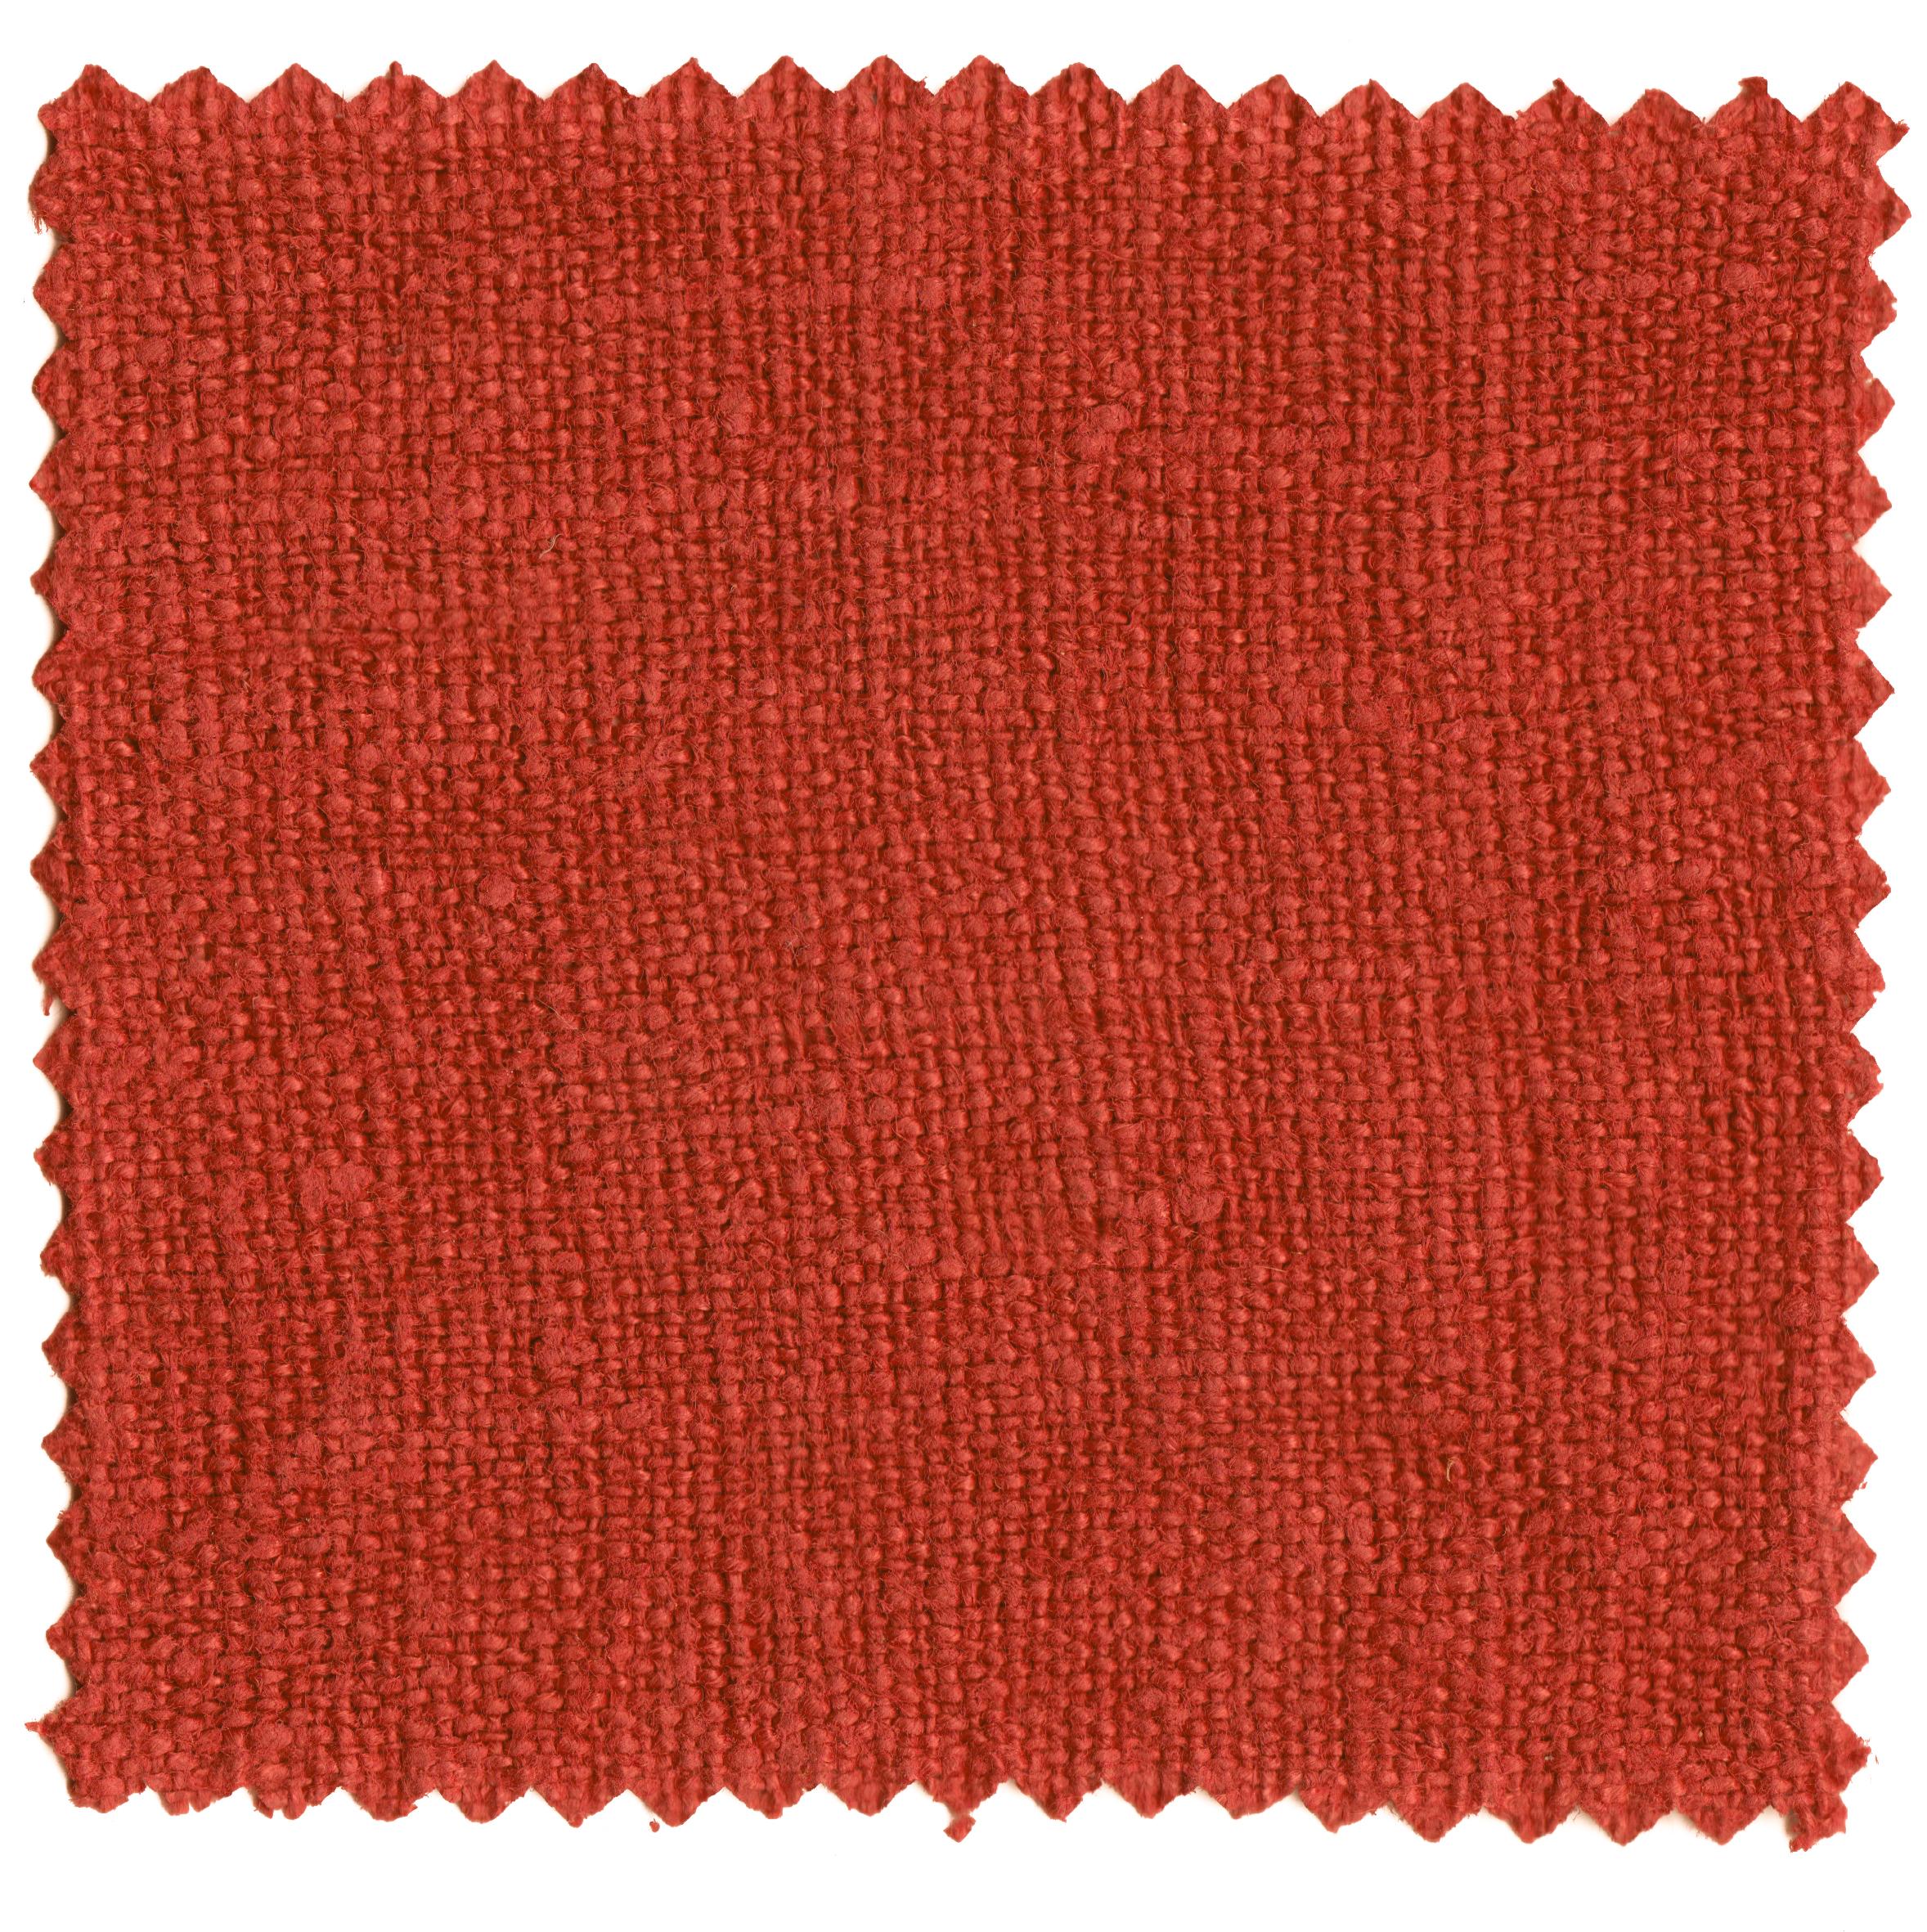 Earth Reds-4.jpg